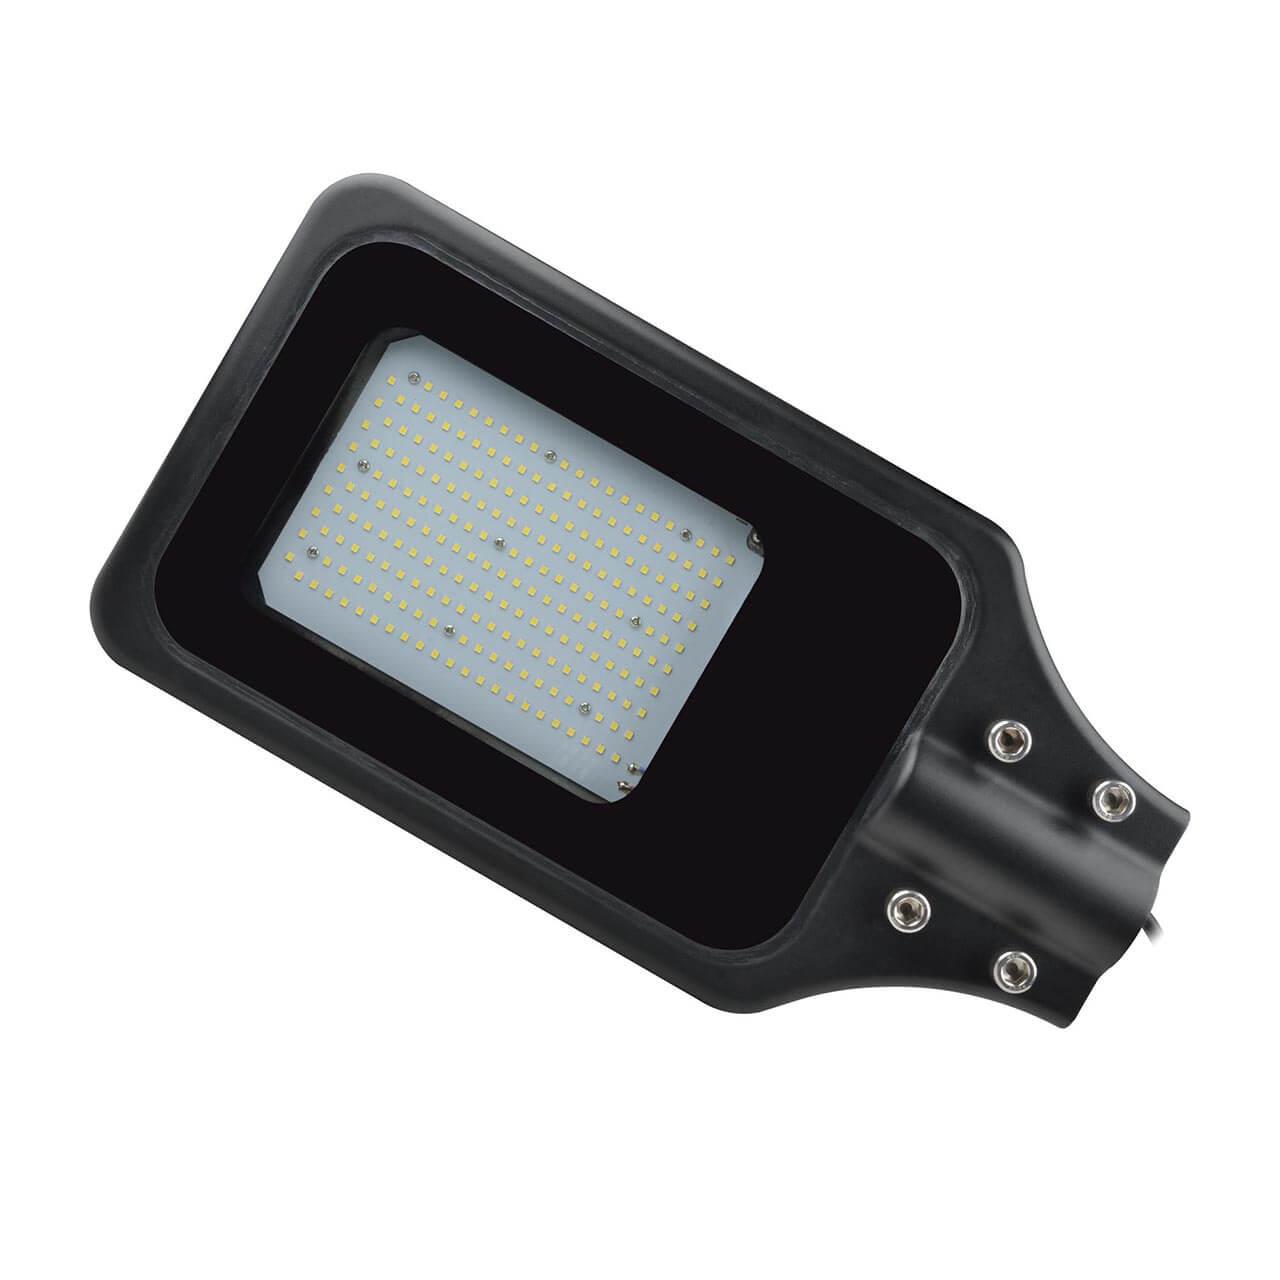 Светильник Uniel ULV-R23H-100W/6000К IP65 Black ULV-R23 уличный светодиодный светильник ul 00003301 uniel ulg r001 020 rgb ip65 ball